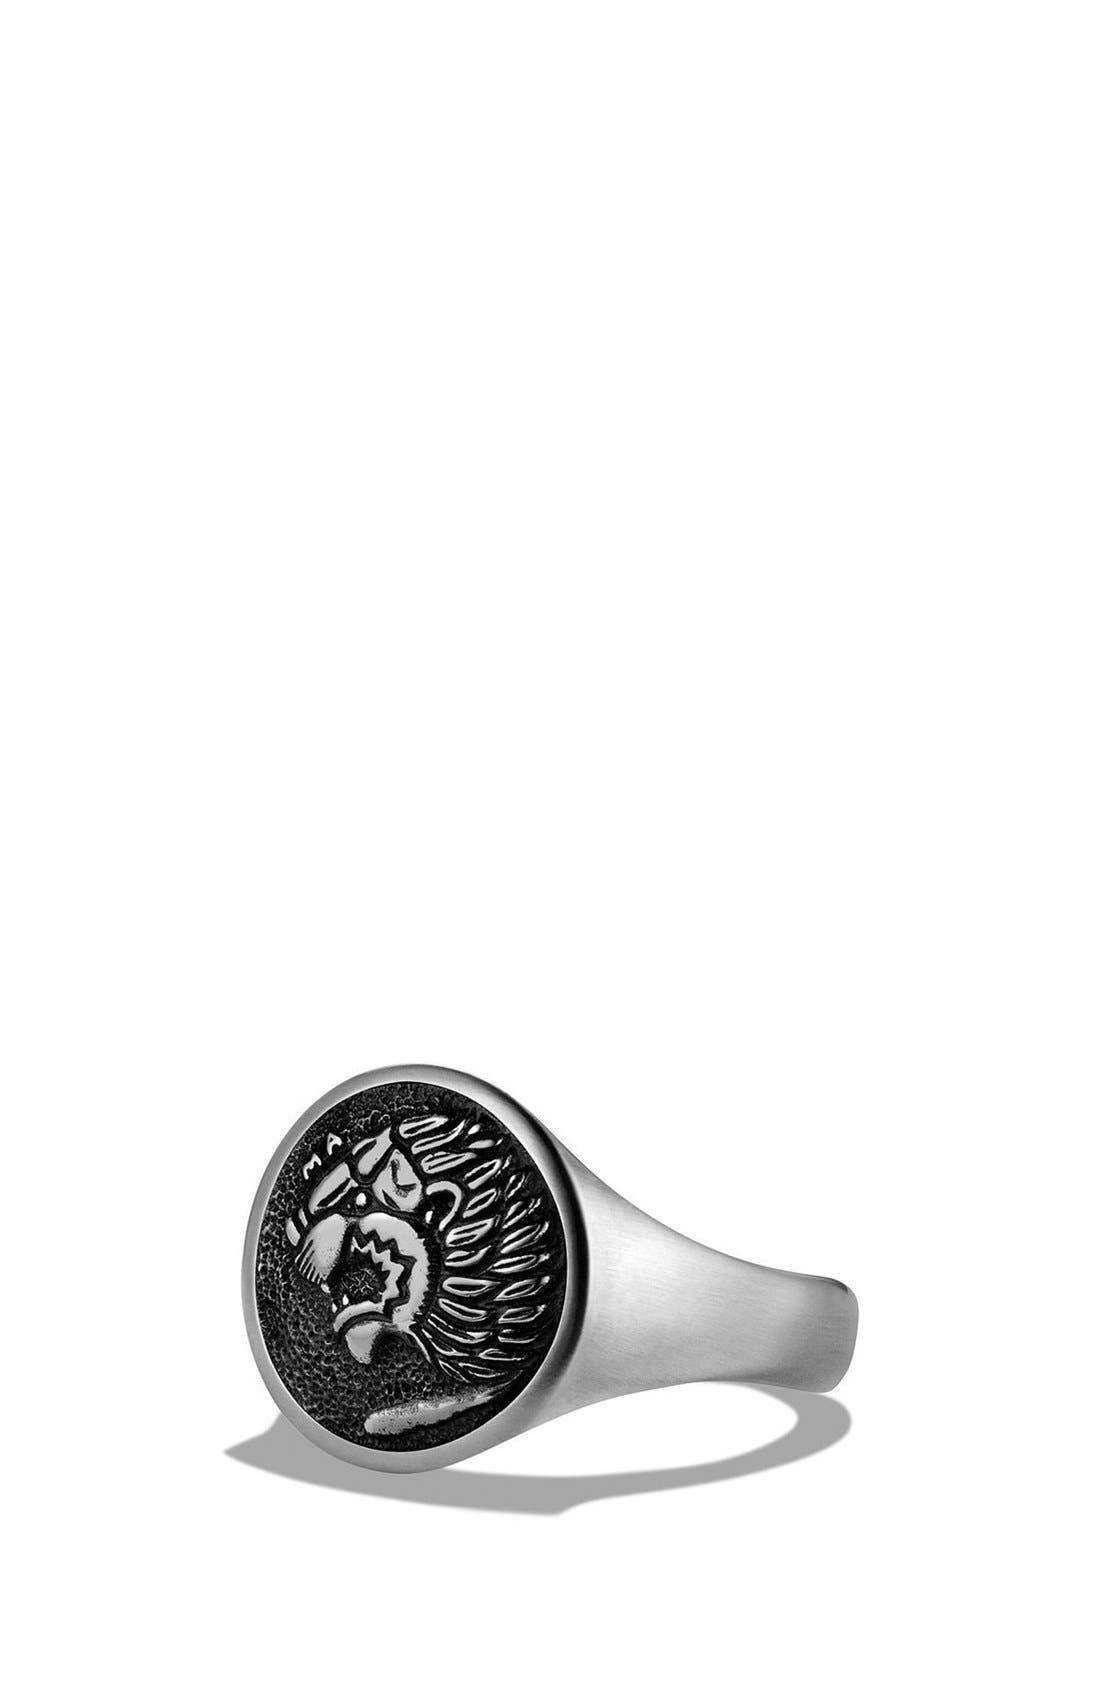 Main Image - David Yurman 'Petrvs' Lion Signet Pinky Ring